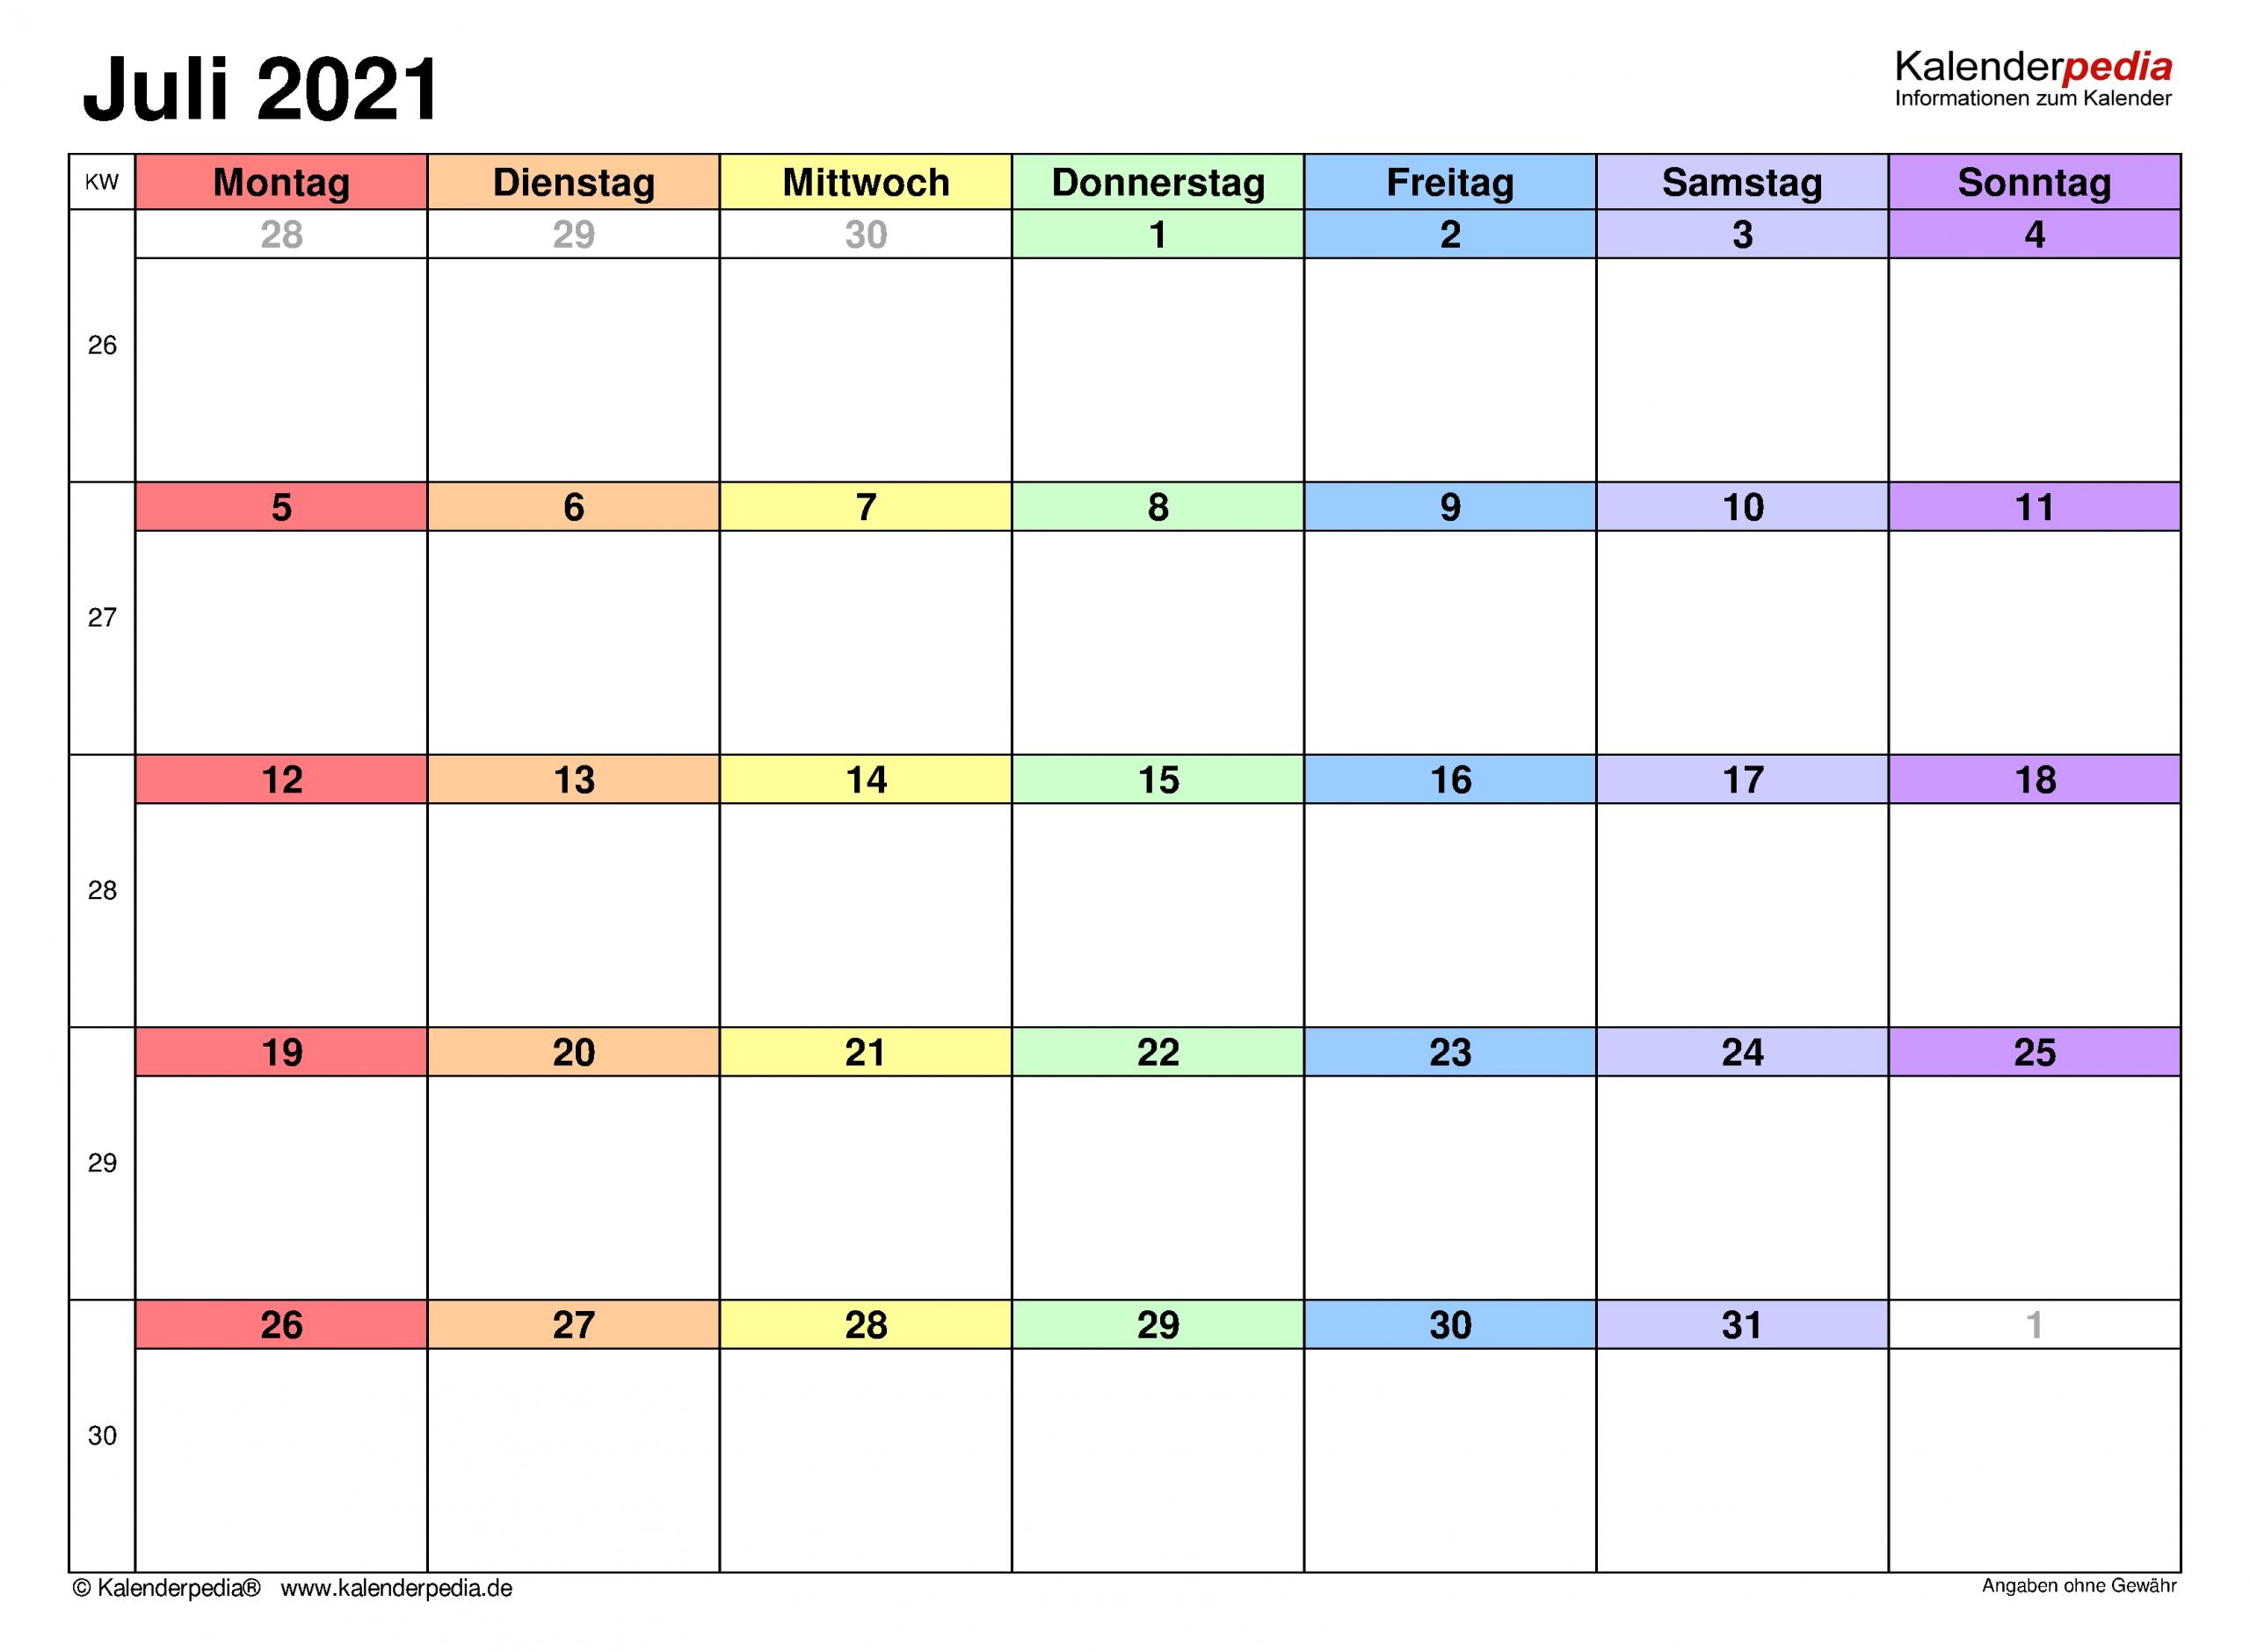 Take Kalenderblatt 2021 Ab Juli